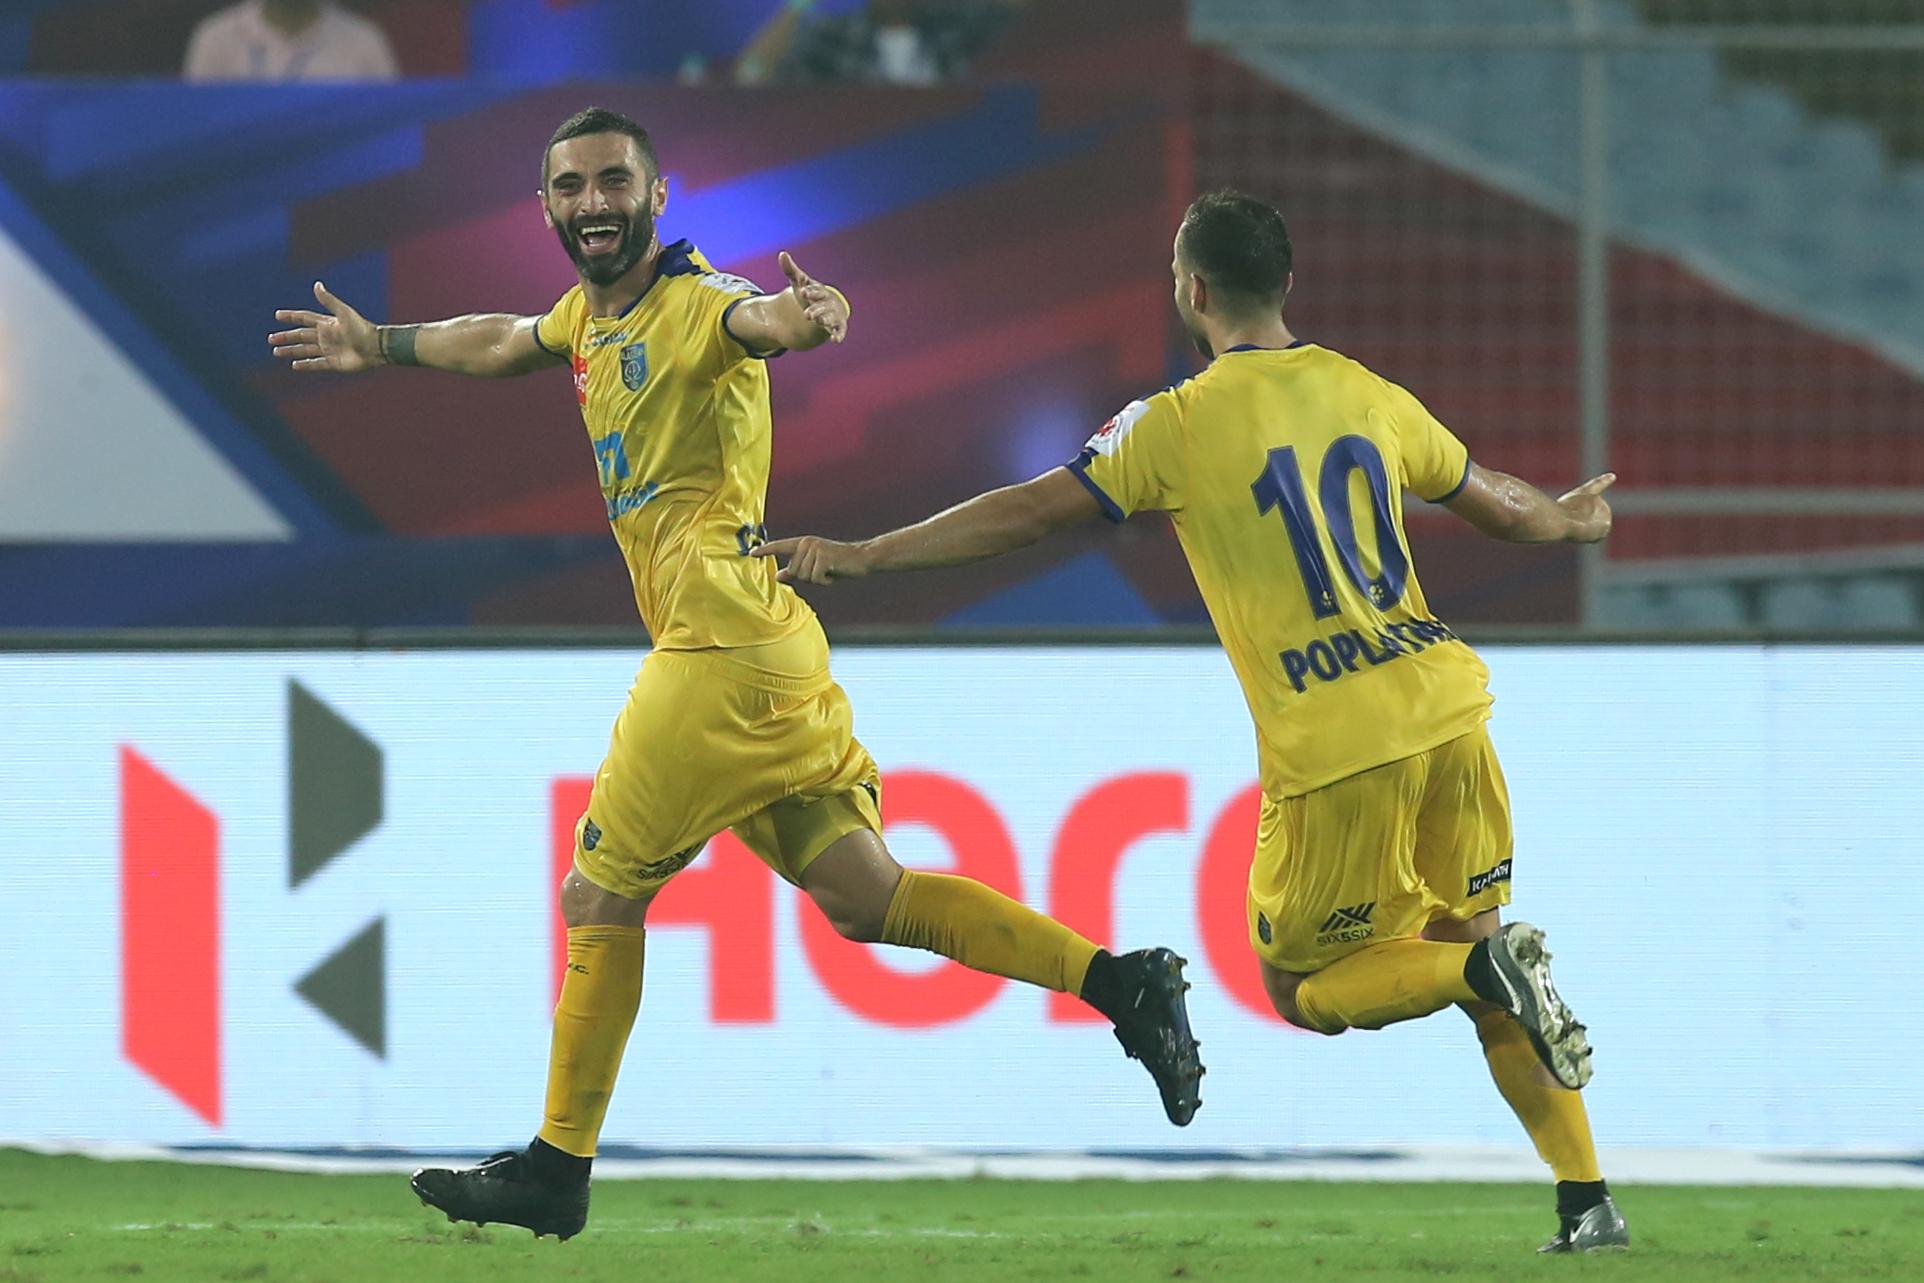 Slavisa Stojanovic ATK Kerala Blasters ISL 2018-19